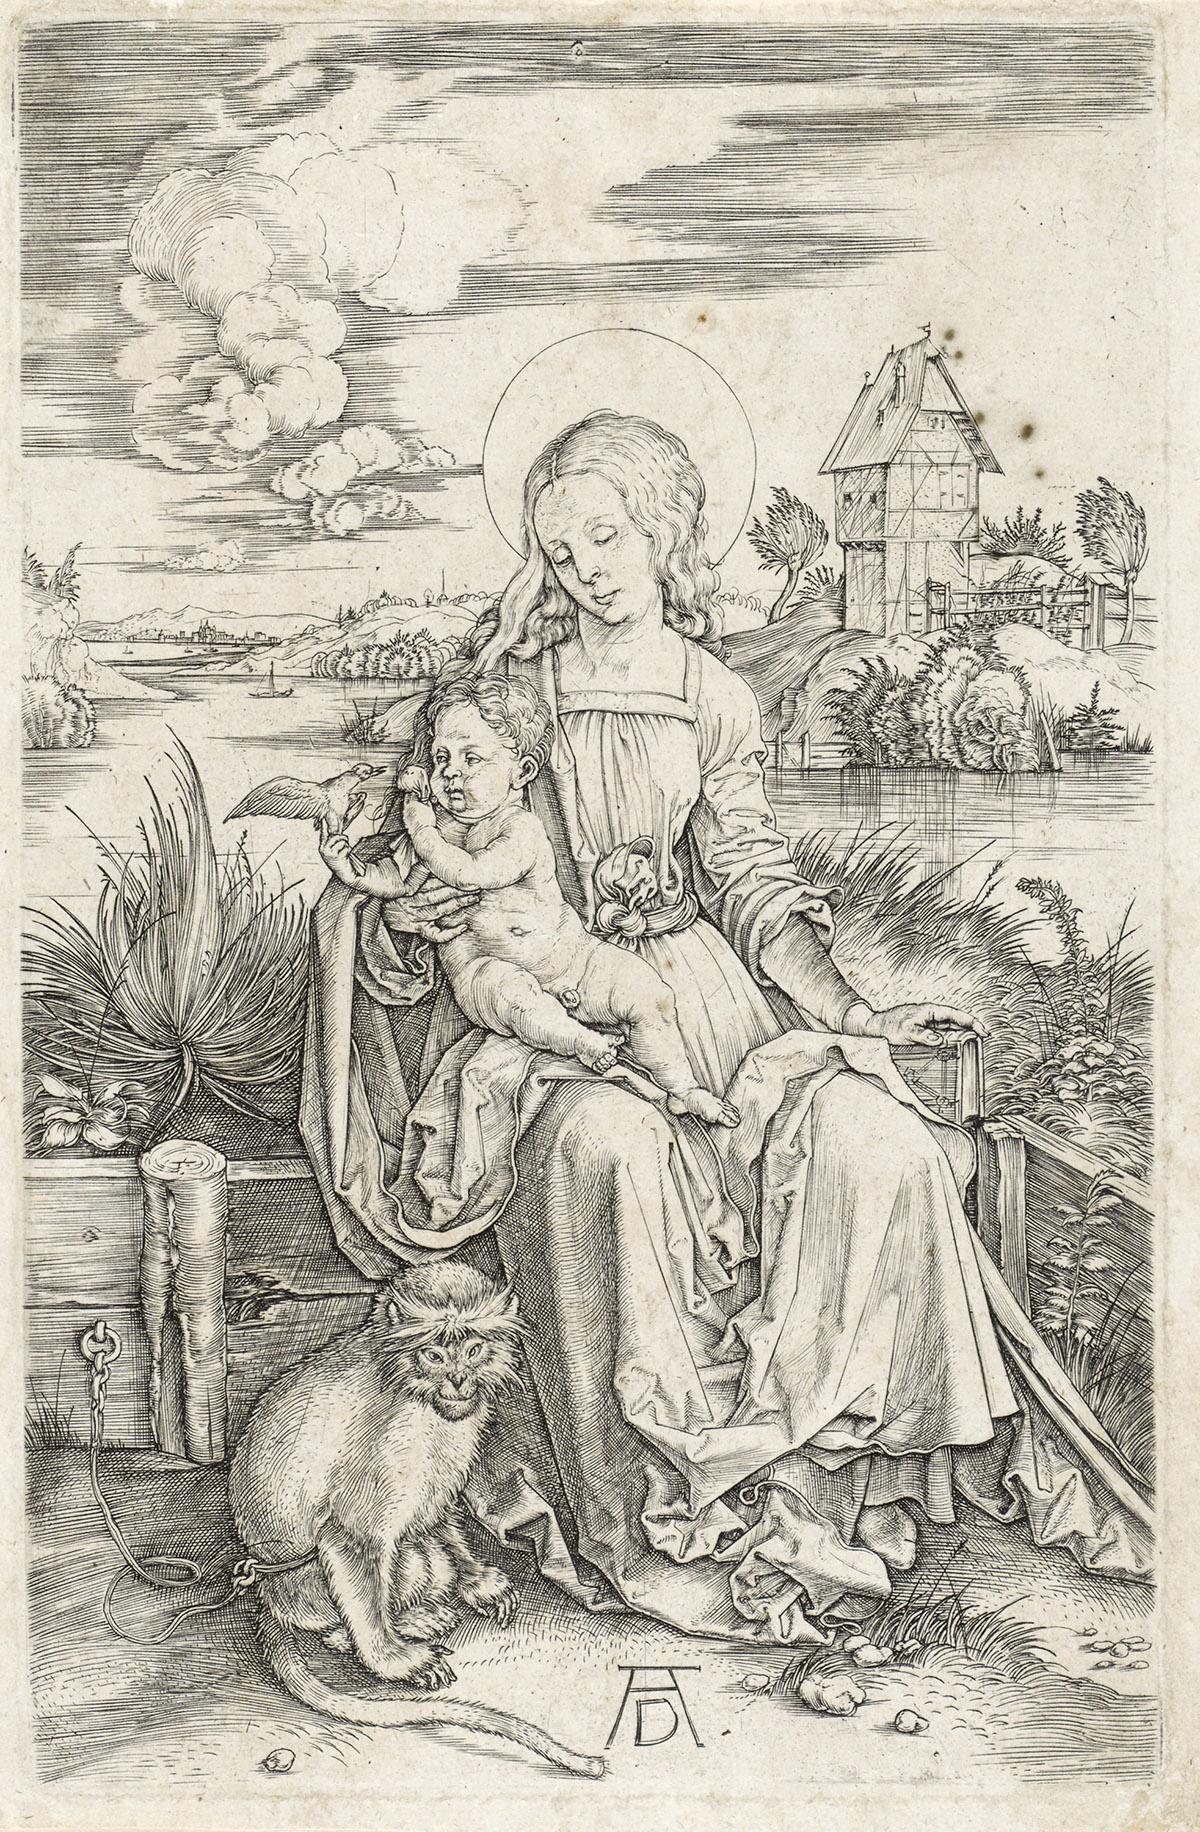 ALBRECHT DÜRER The Virgin and Child with the Monkey.